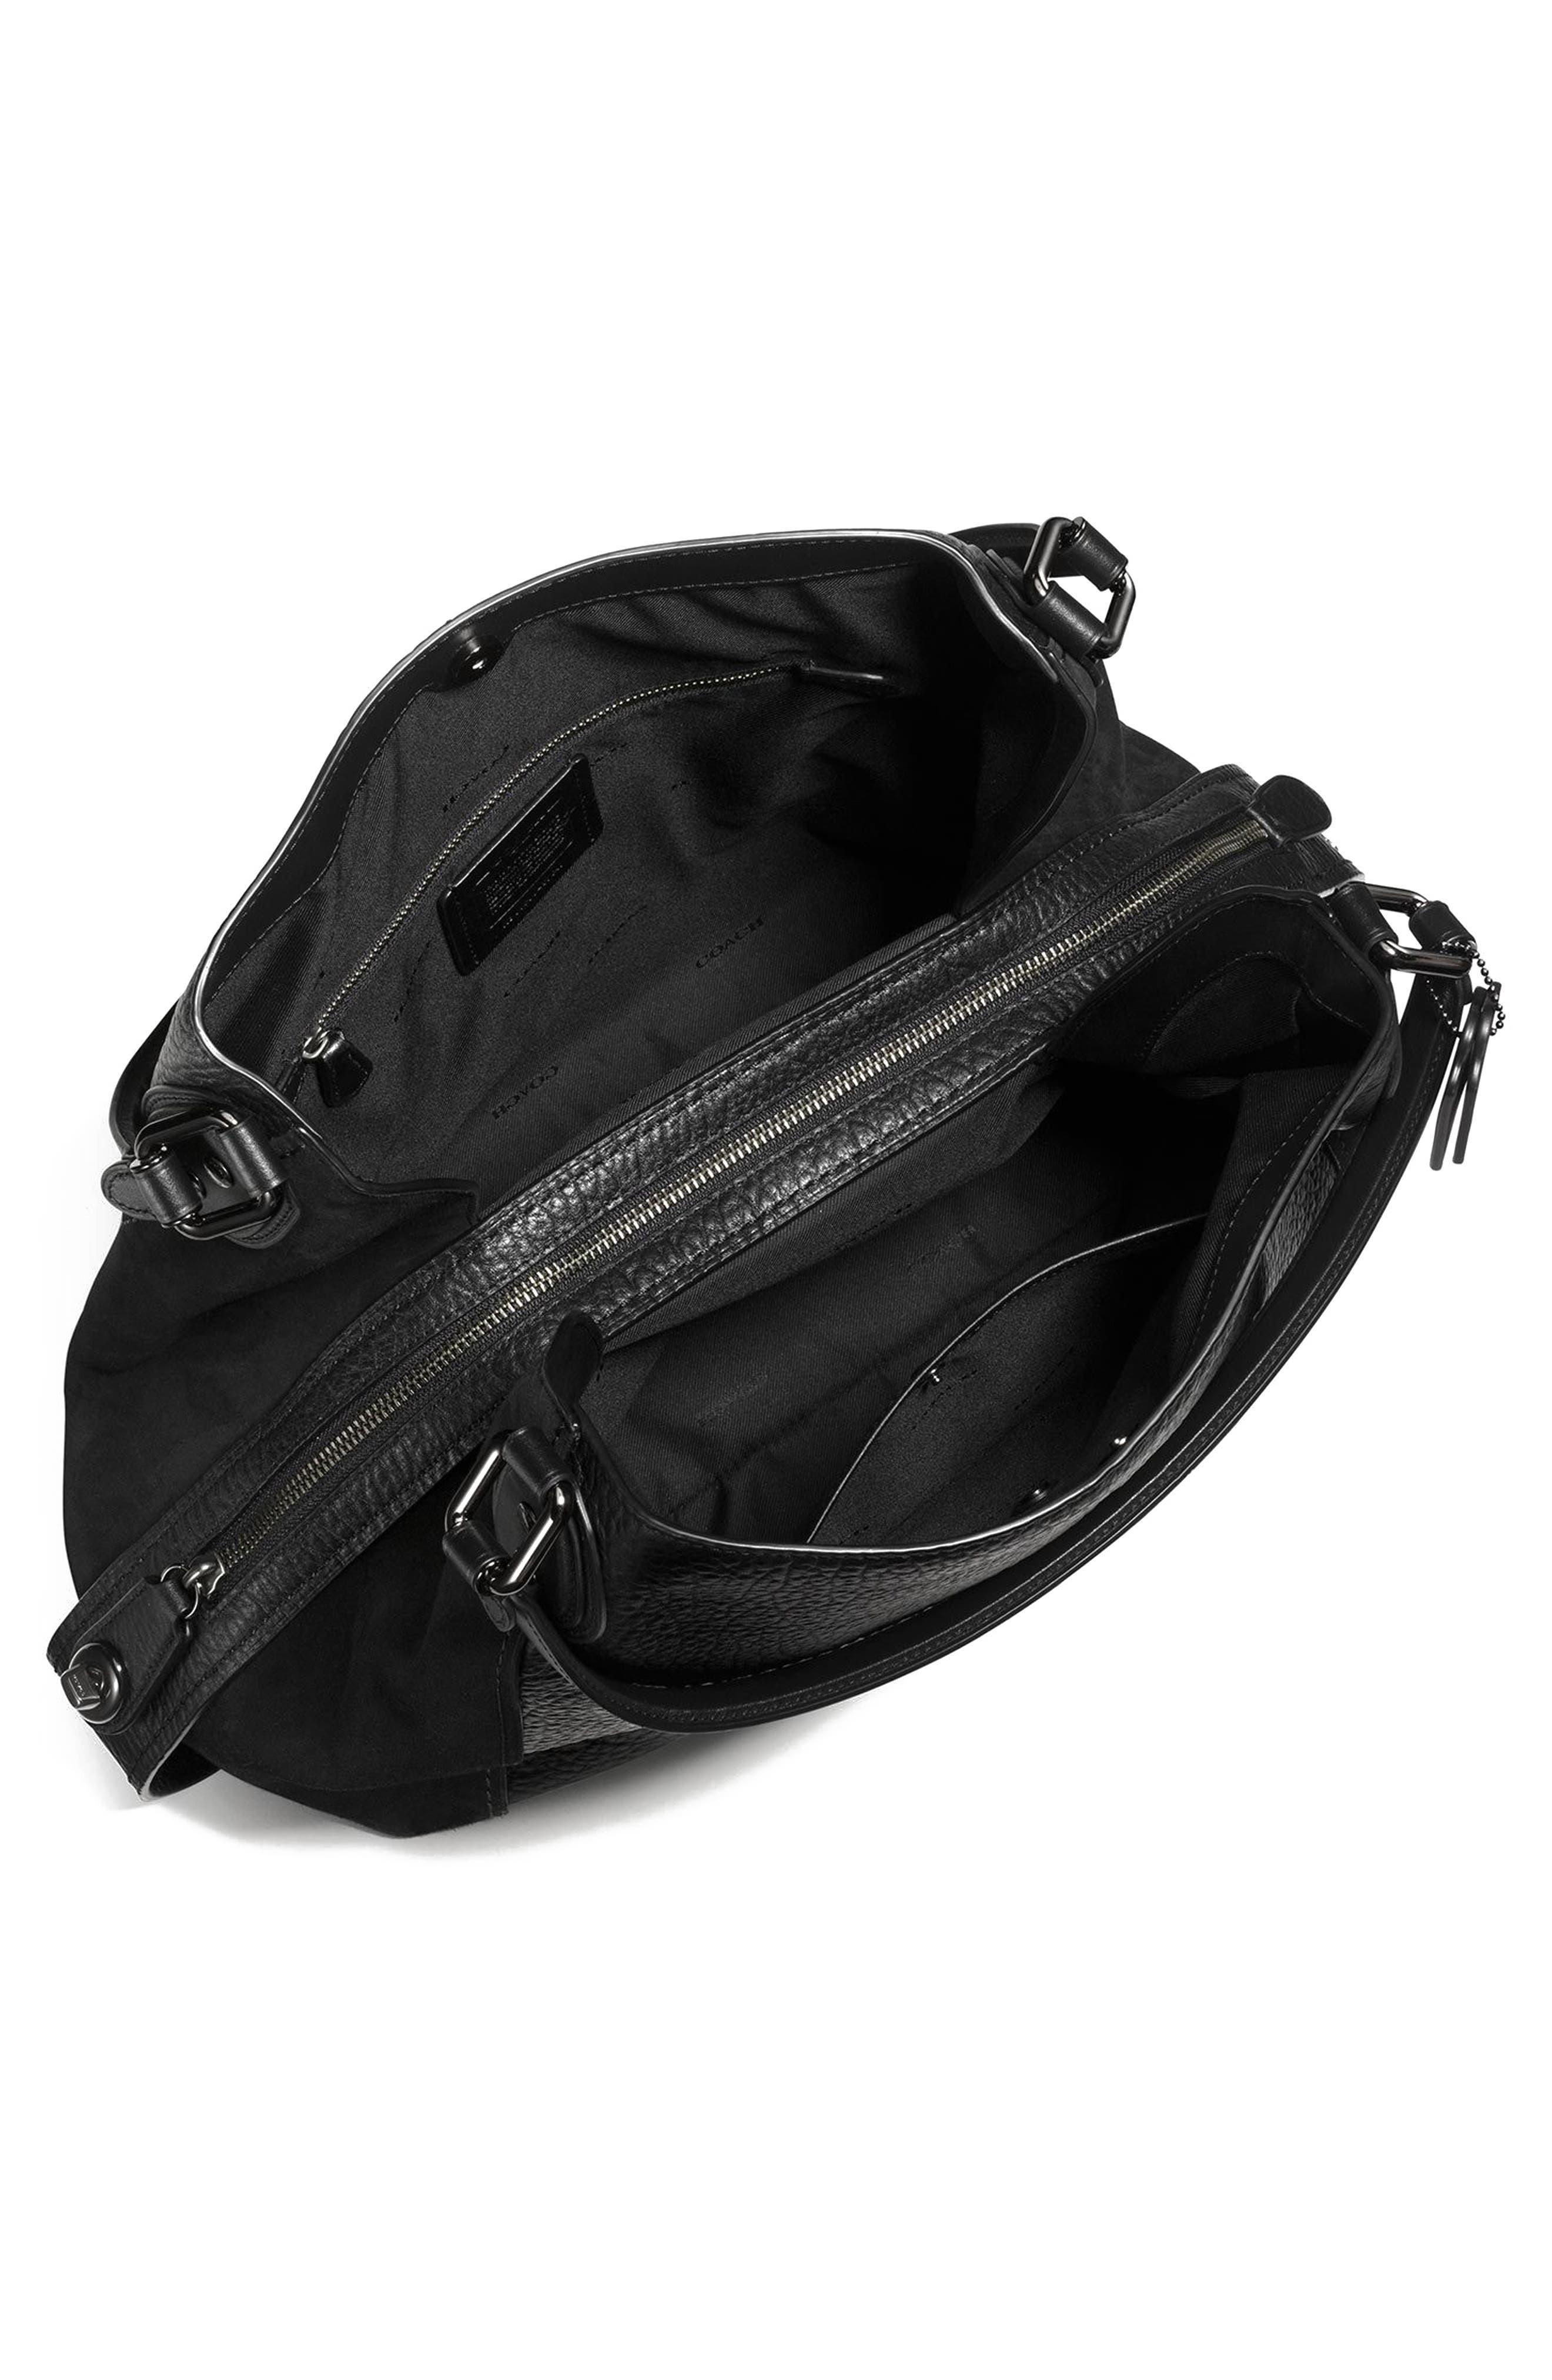 Edie 42 Leather & Suede Shoulder Bag,                             Alternate thumbnail 4, color,                             BLACK